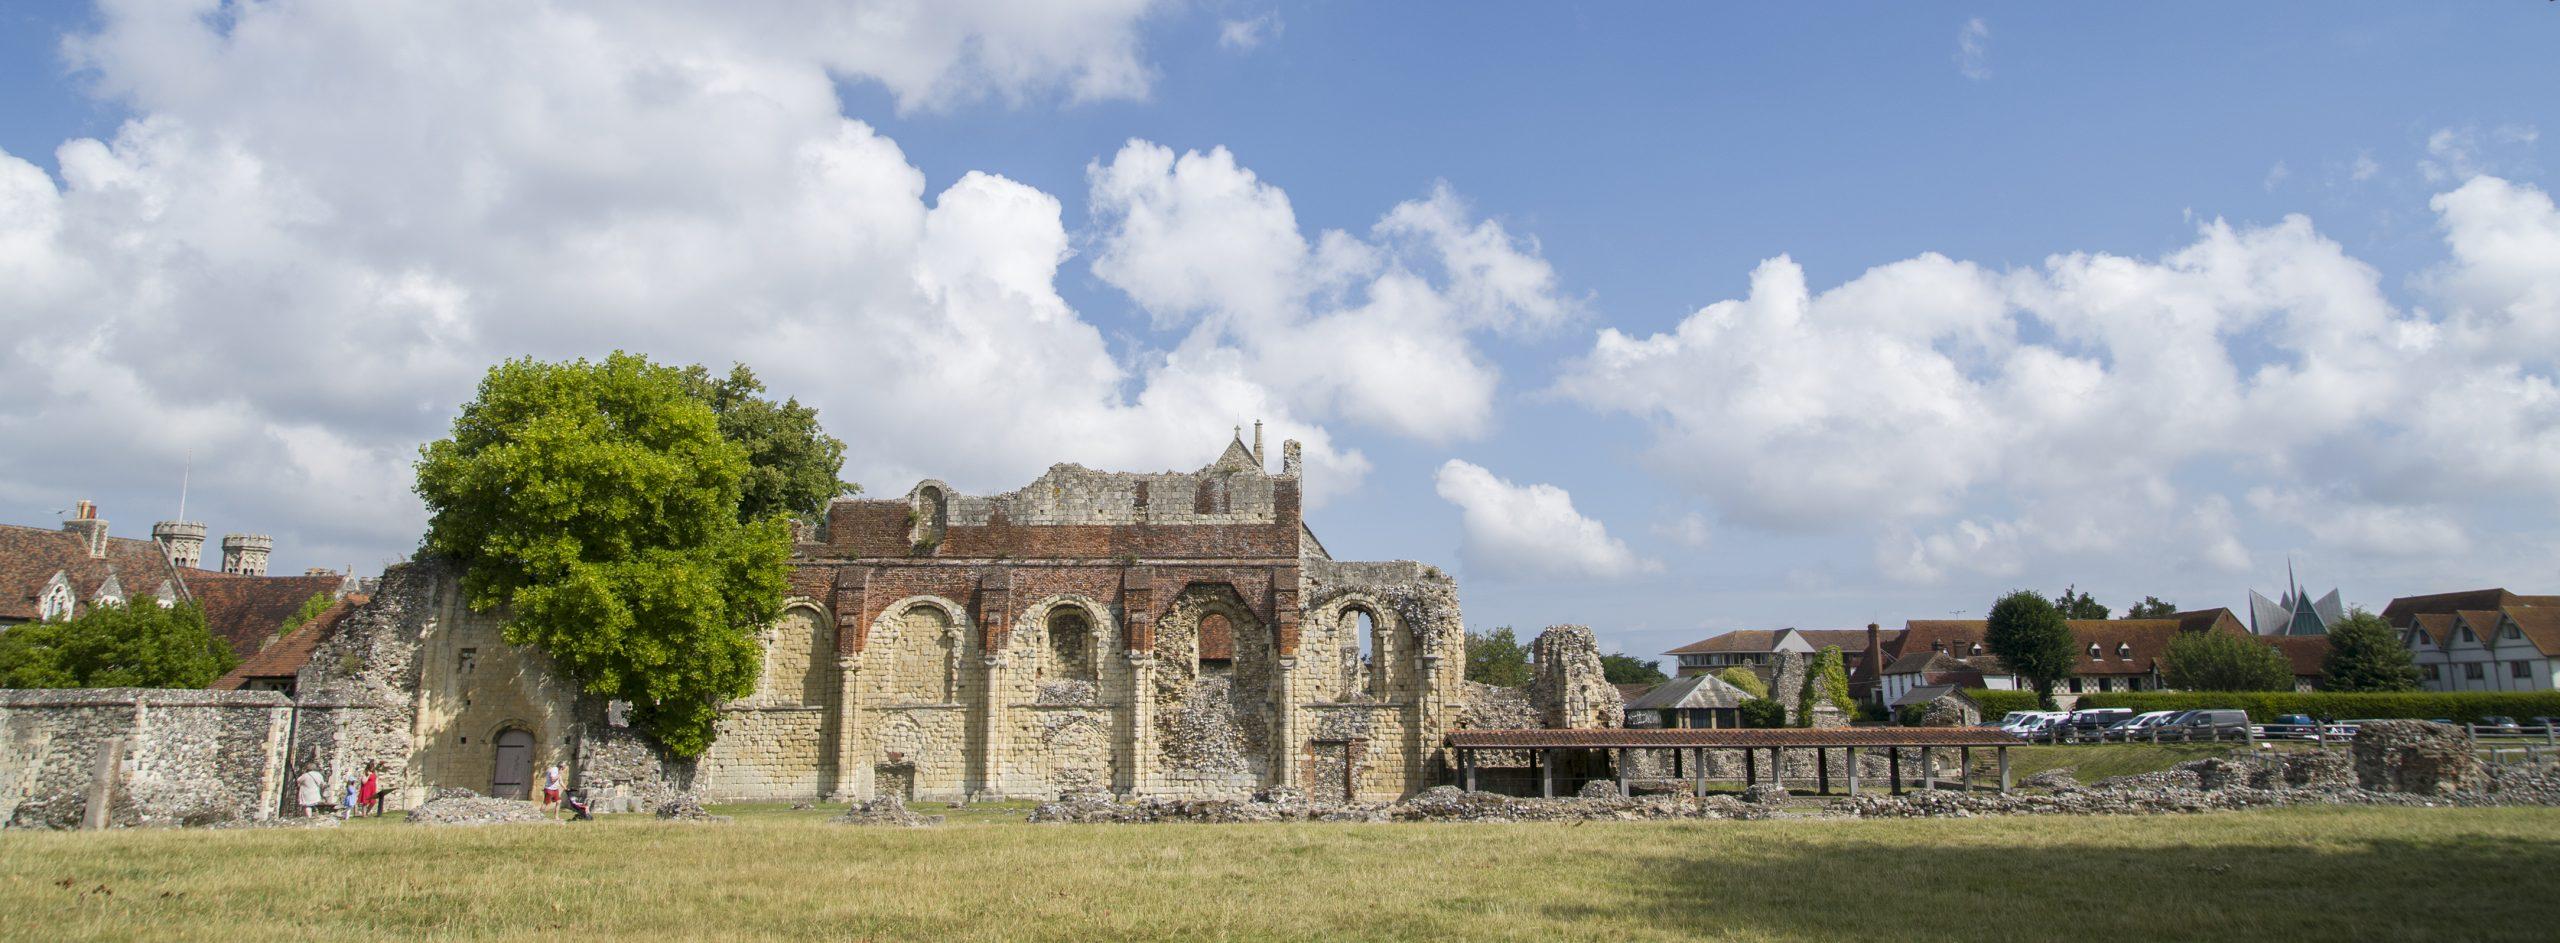 St Augustinus Abbey